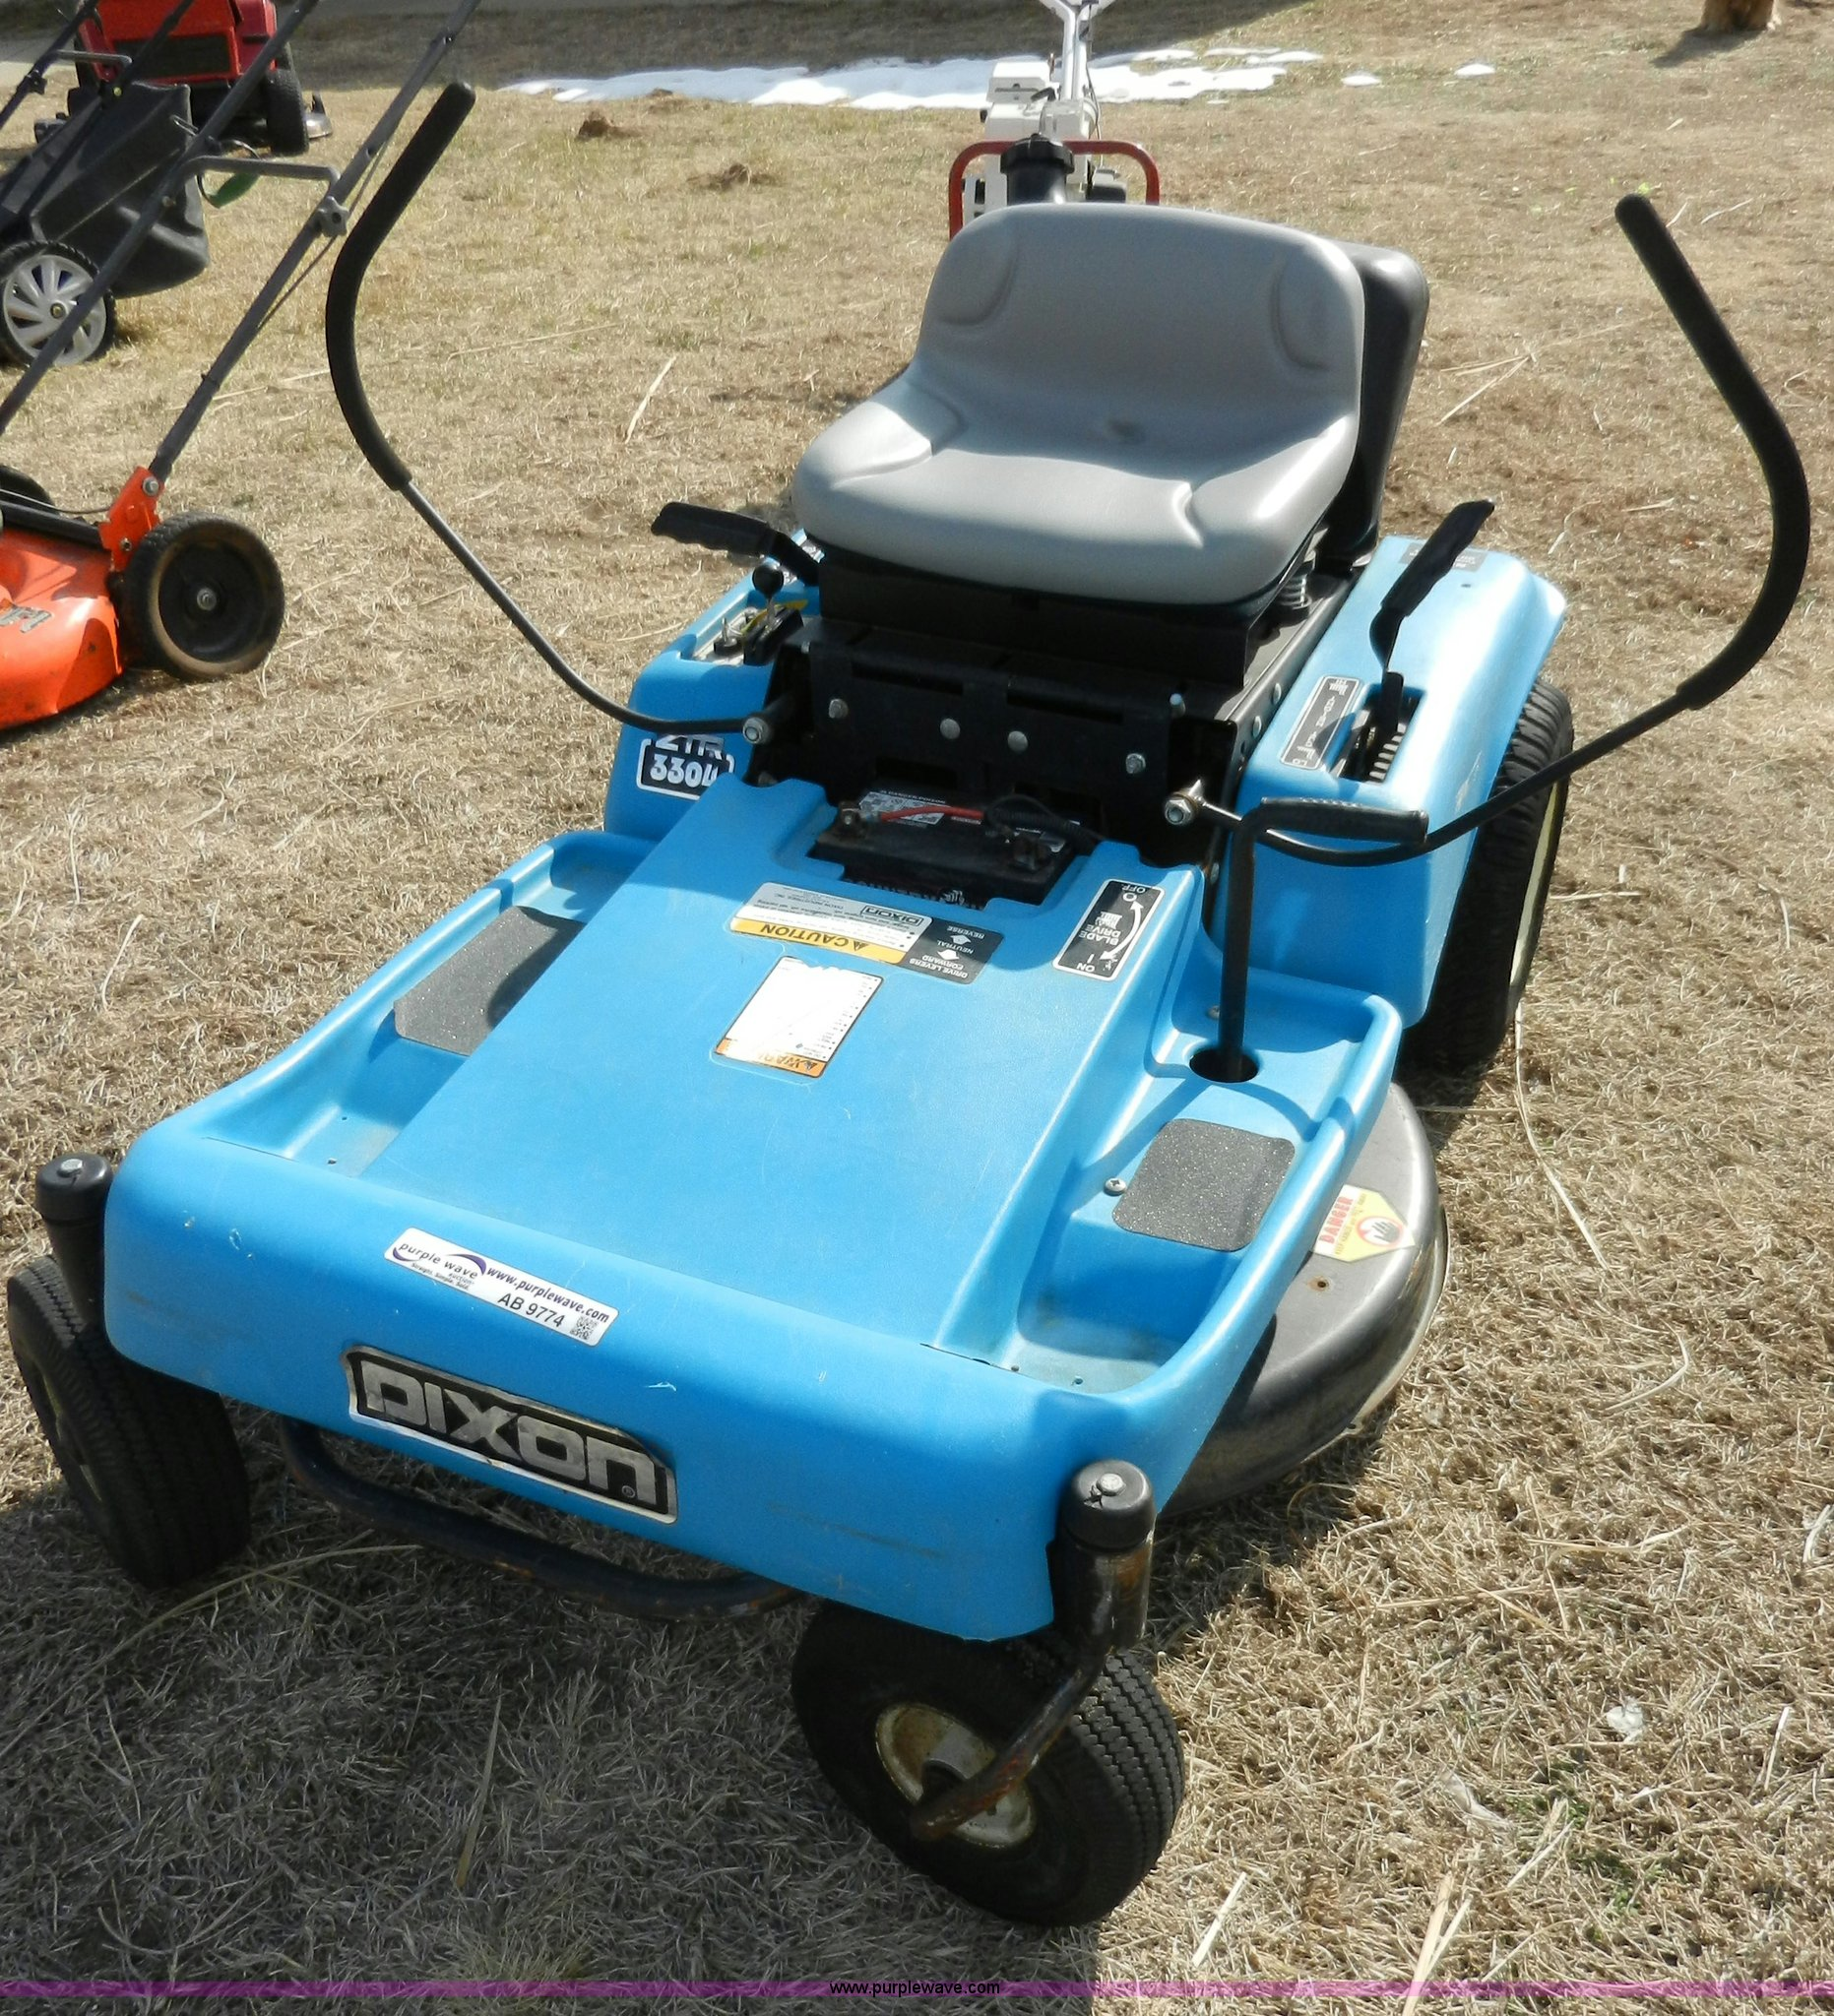 Dixon 3304 zero turn lawn mower in Abilene, KS | Item AB9774 sold | Purple  Wave